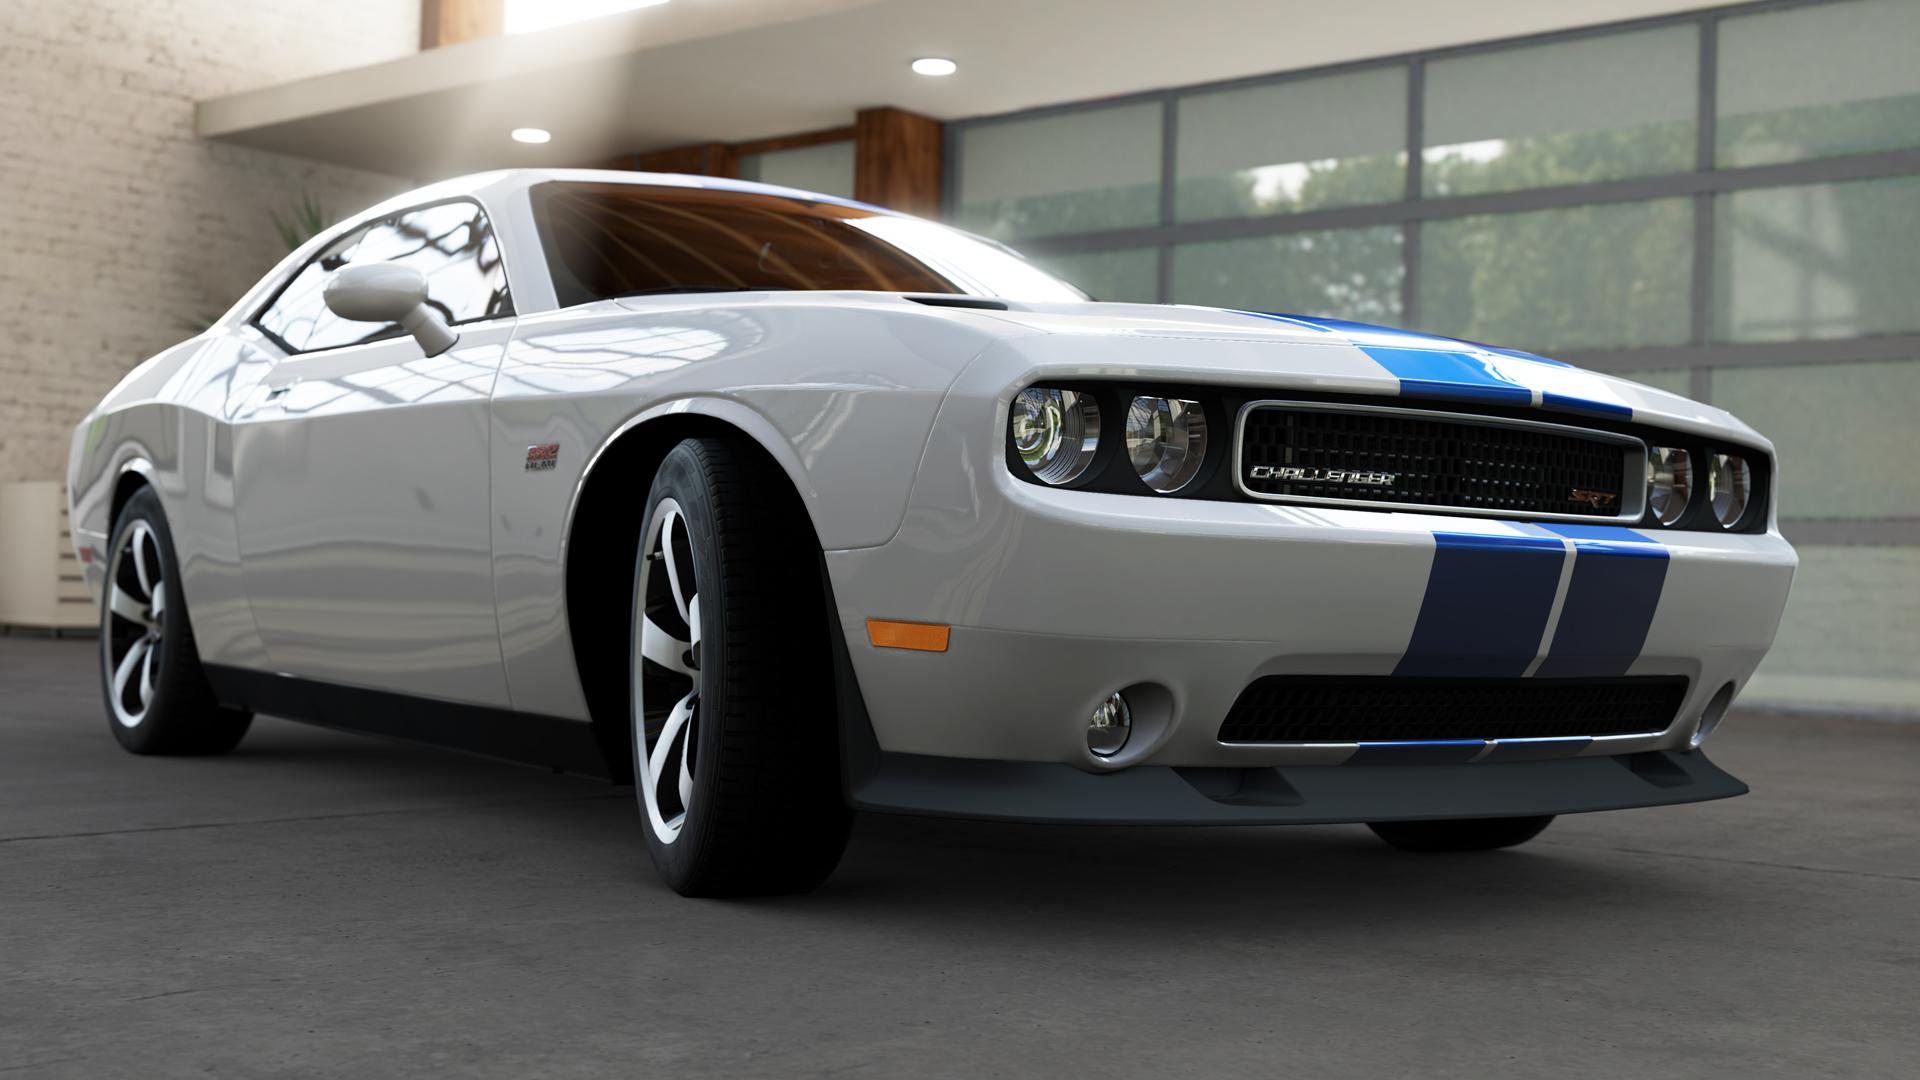 2012 dodge challenger srt8 392 - 2012 Dodge Challenger Srt8 392